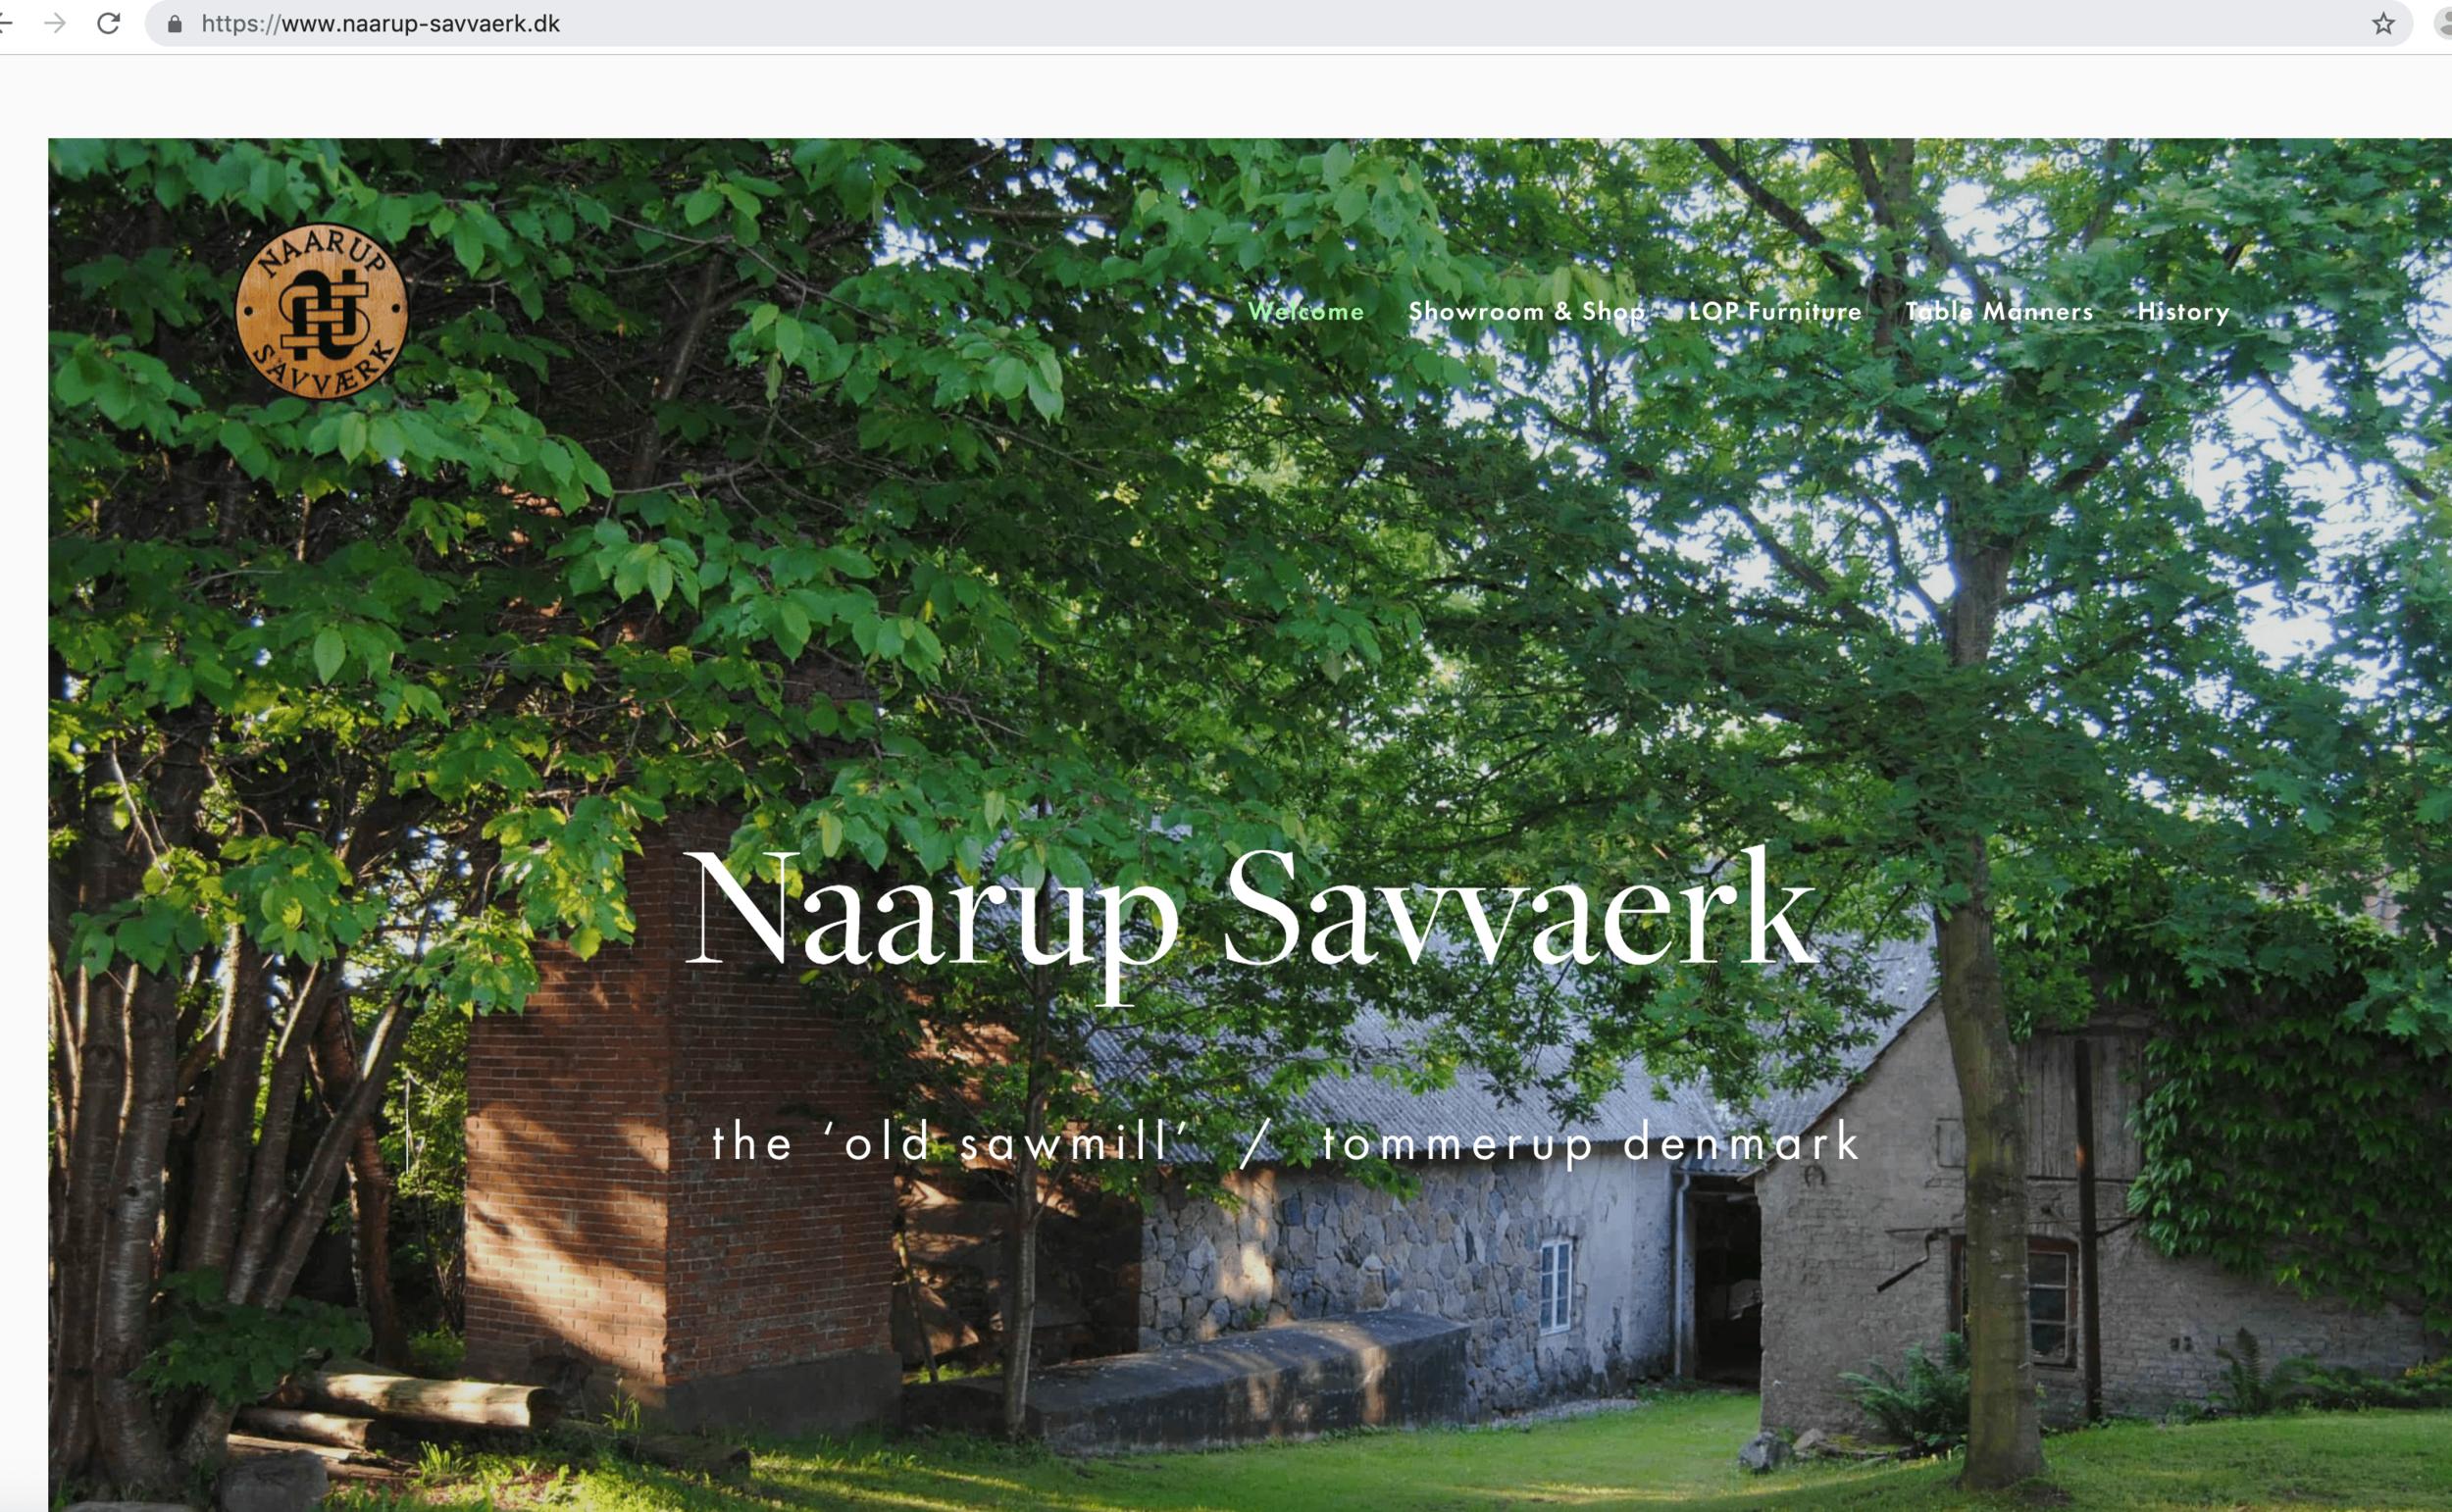 www.naarup-savvaerk.dk-min.png